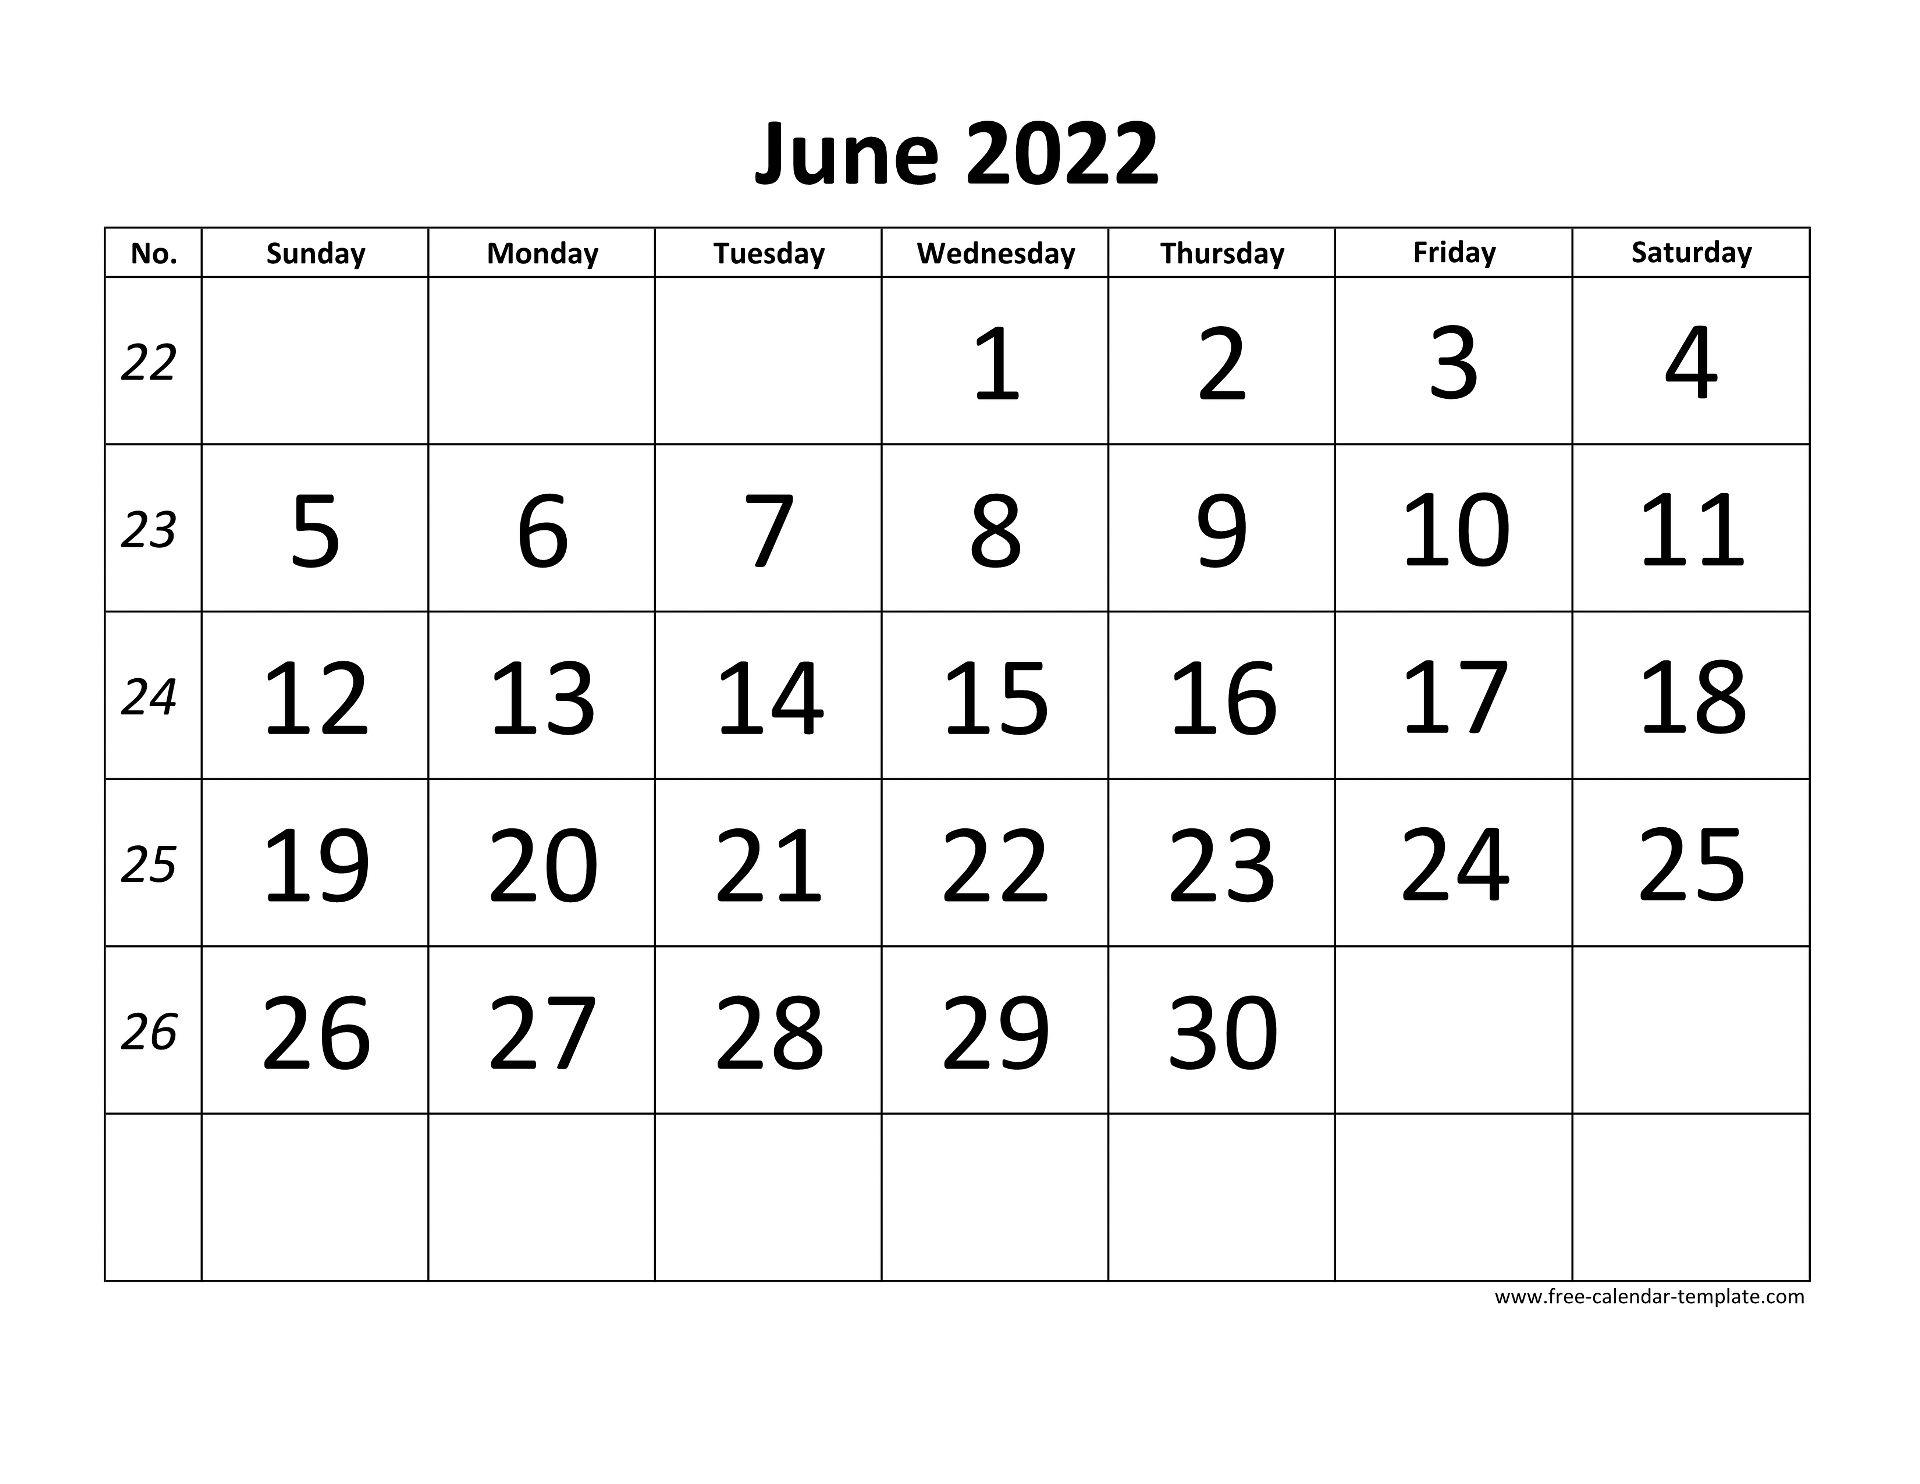 June 2022 Free Calendar Tempplate | Free-calendar-template.com